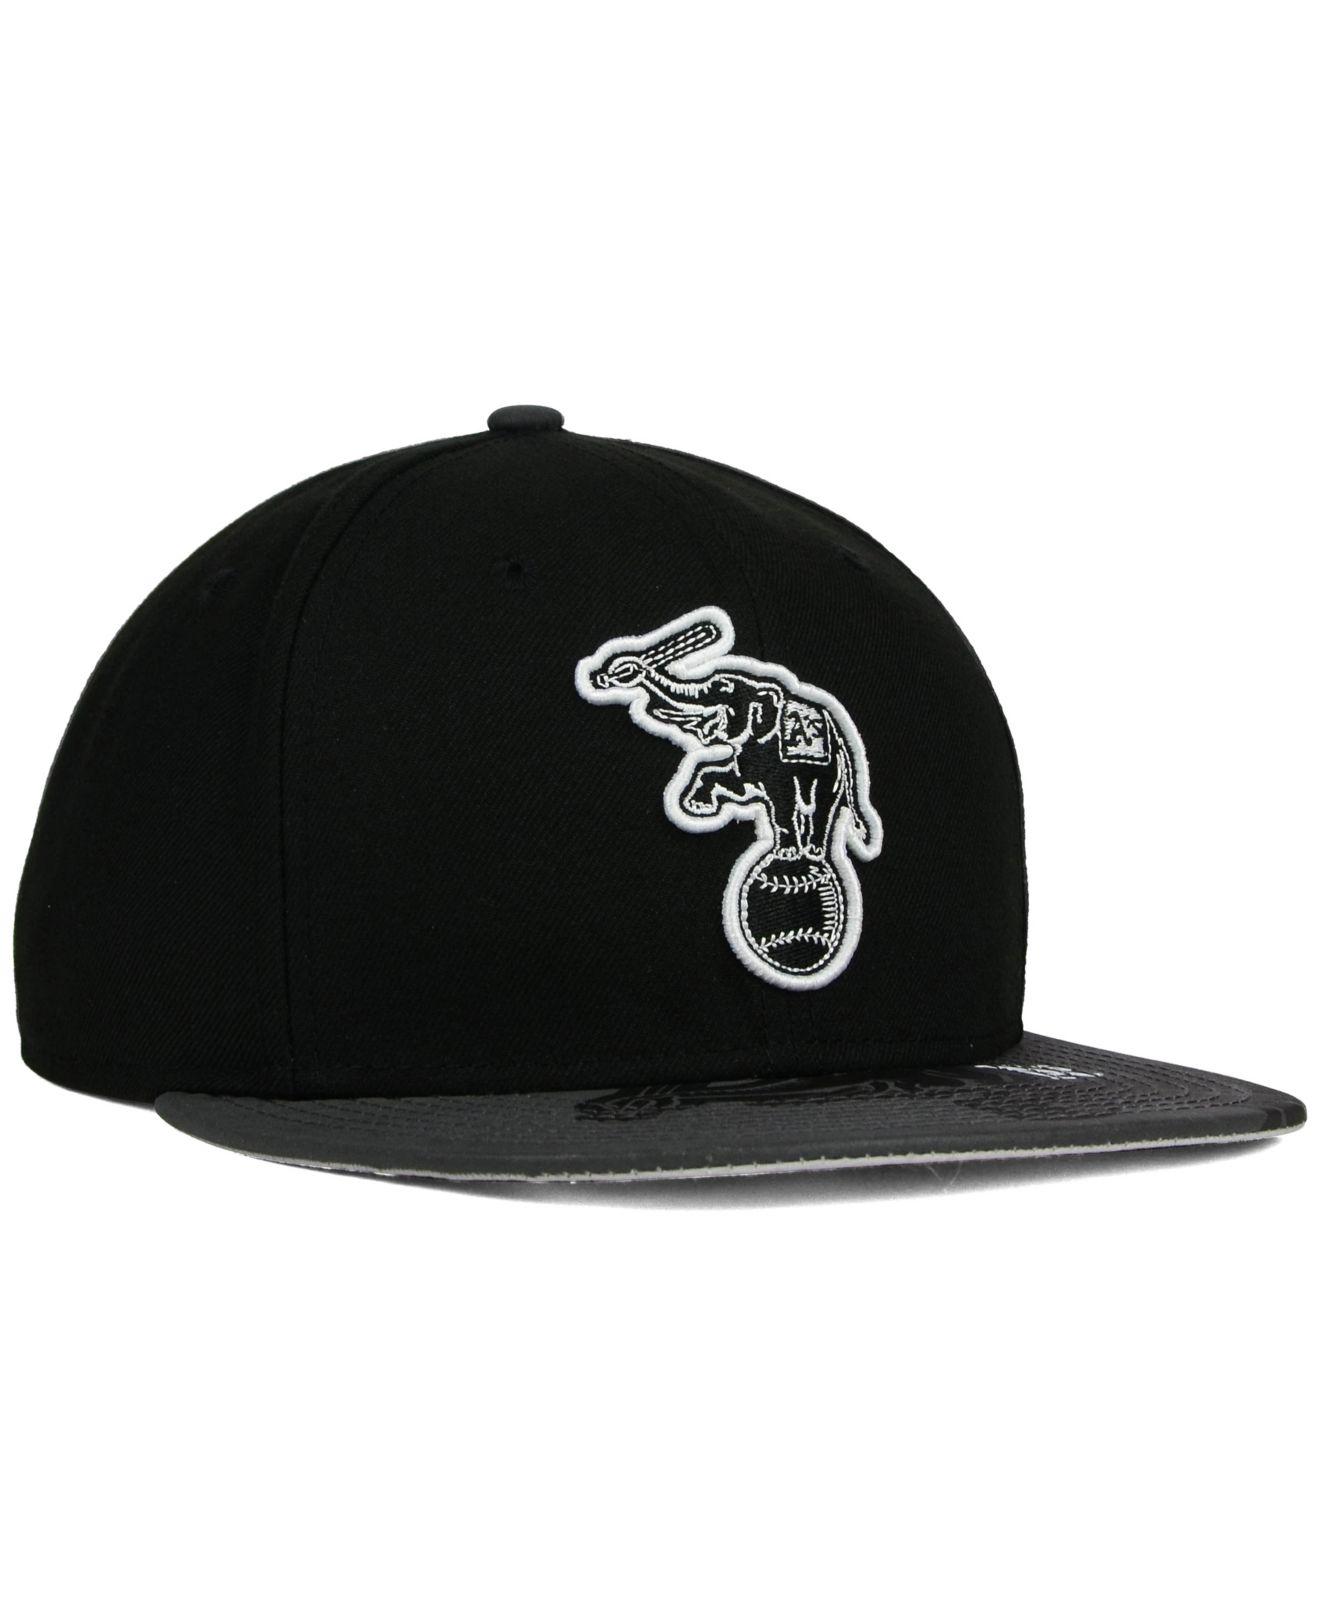 promo code 82a4e 014f8 ... black for men a3afe 62753  spain lyst ktz oakland athletics foil pop  redux 9fifty snapback cap in 1b522 21f08